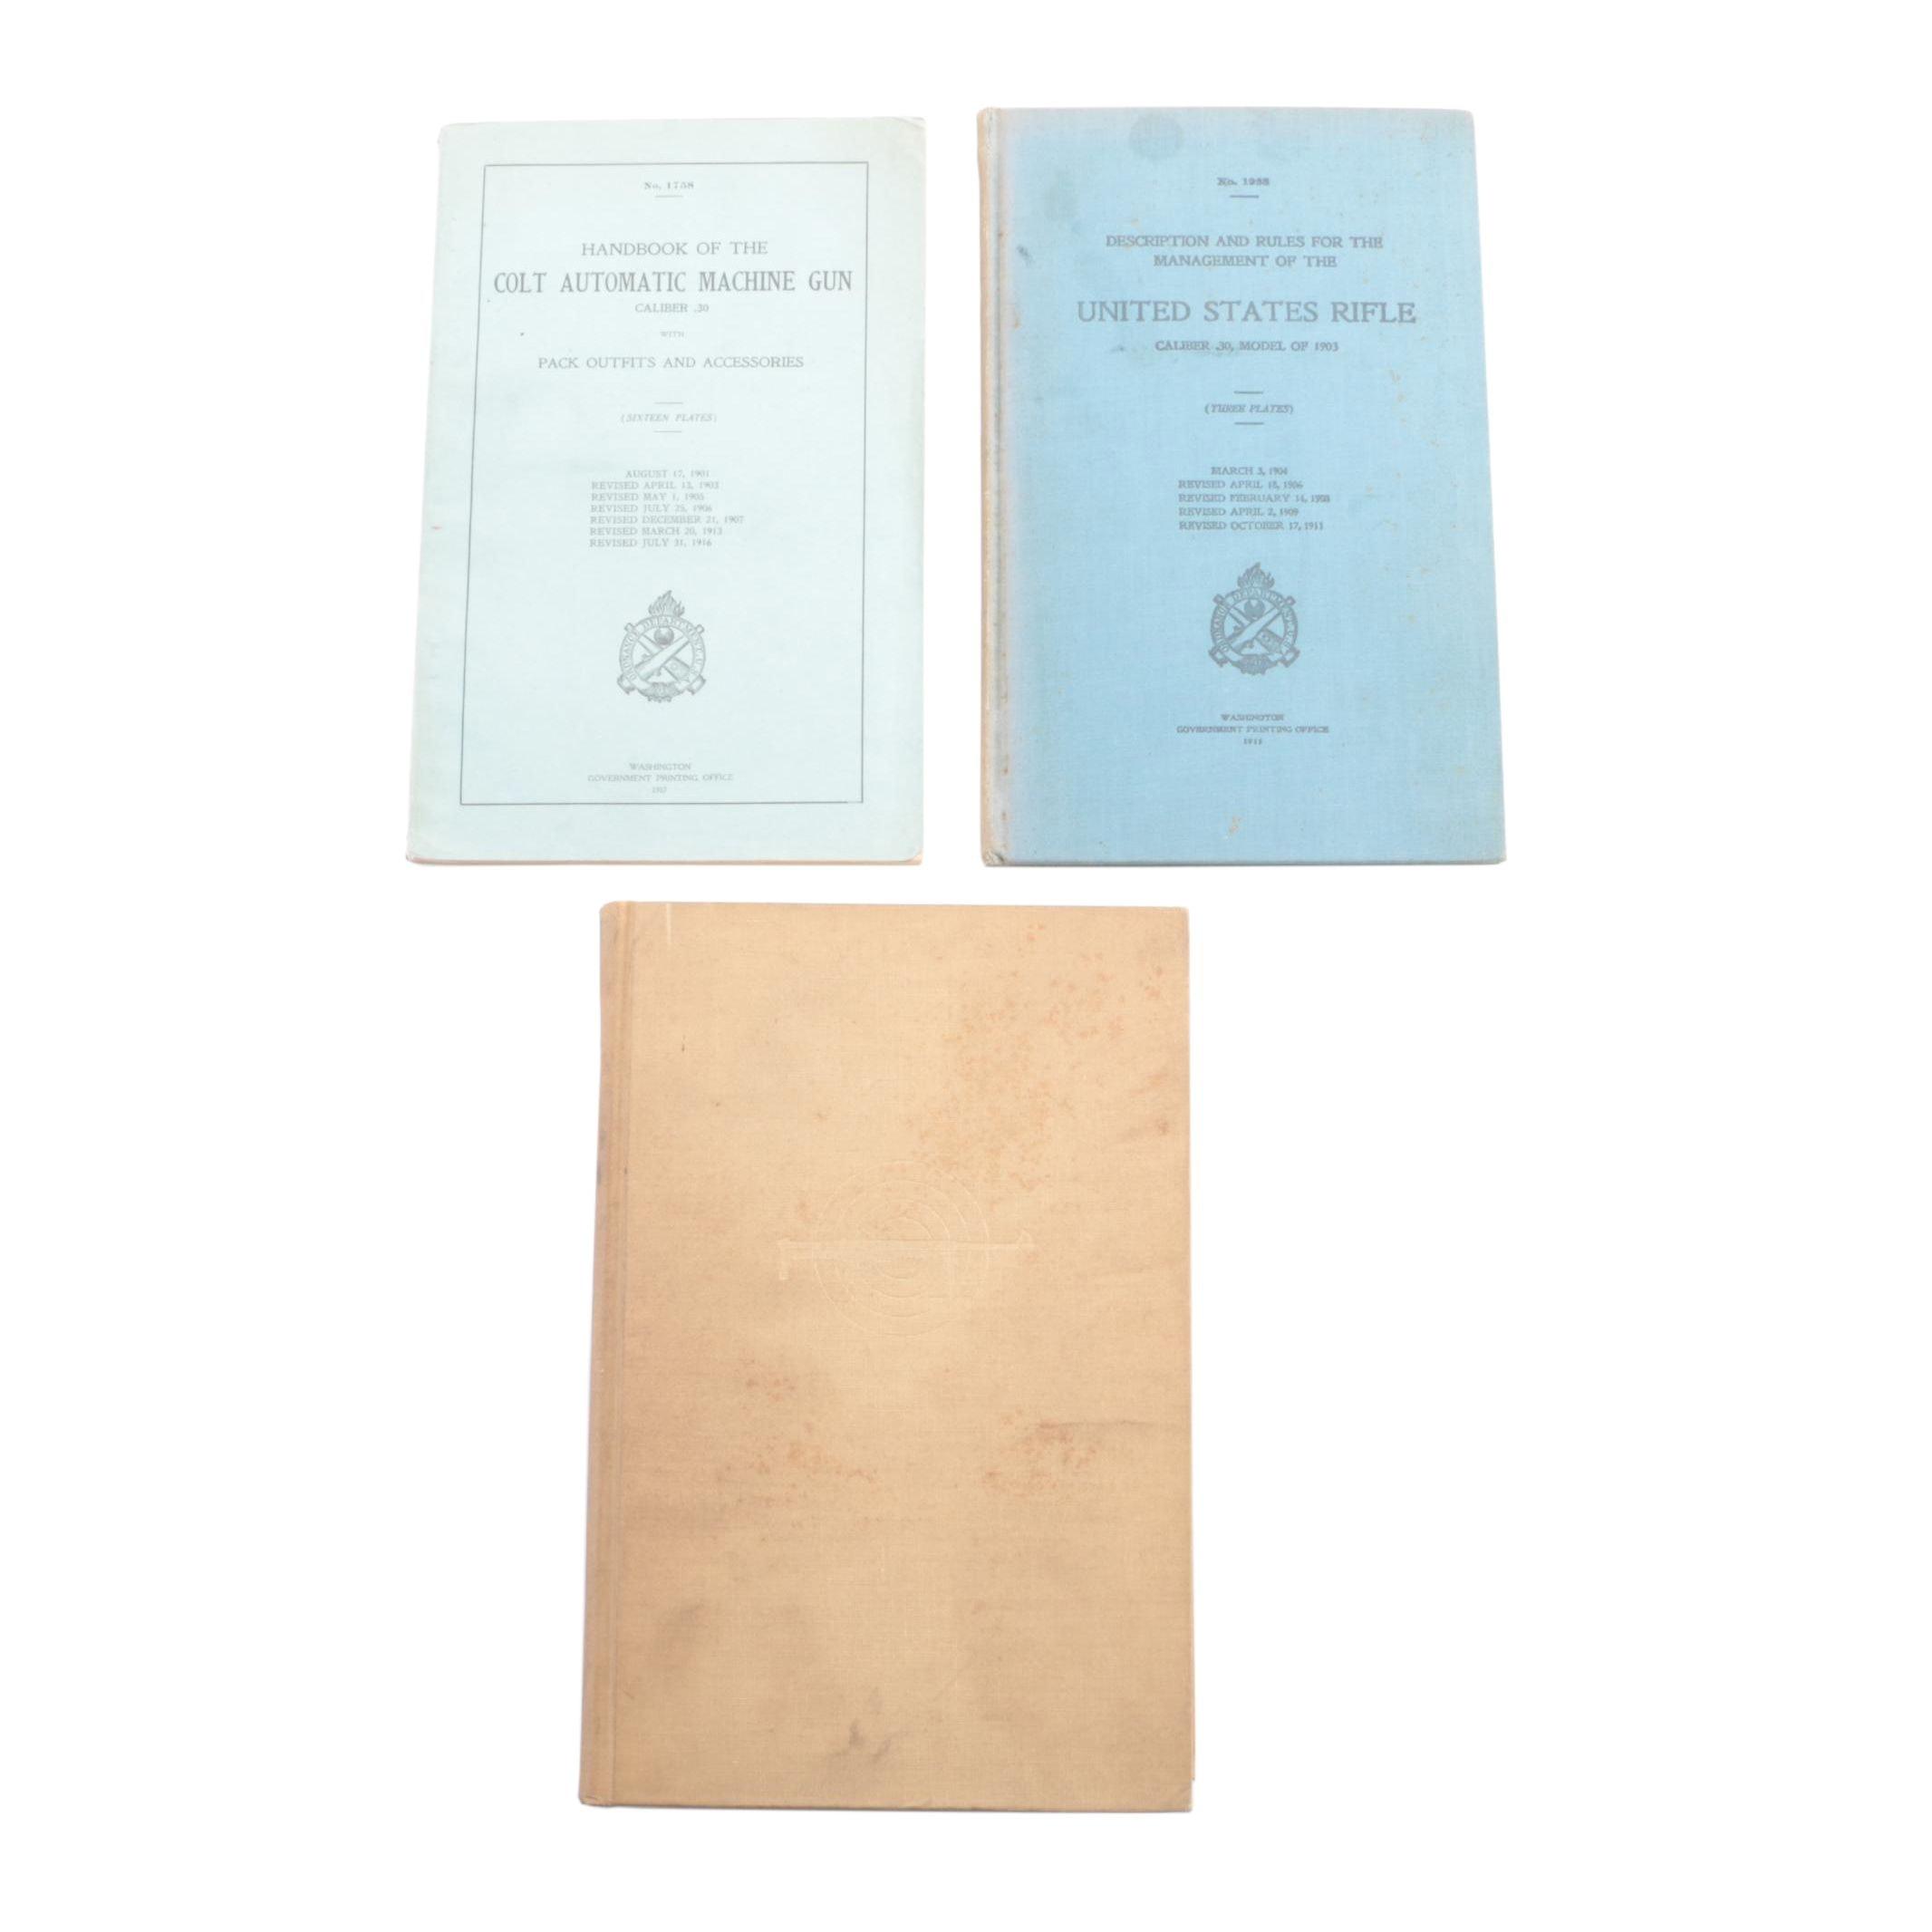 Vintage Military Handbooks and Hardcover